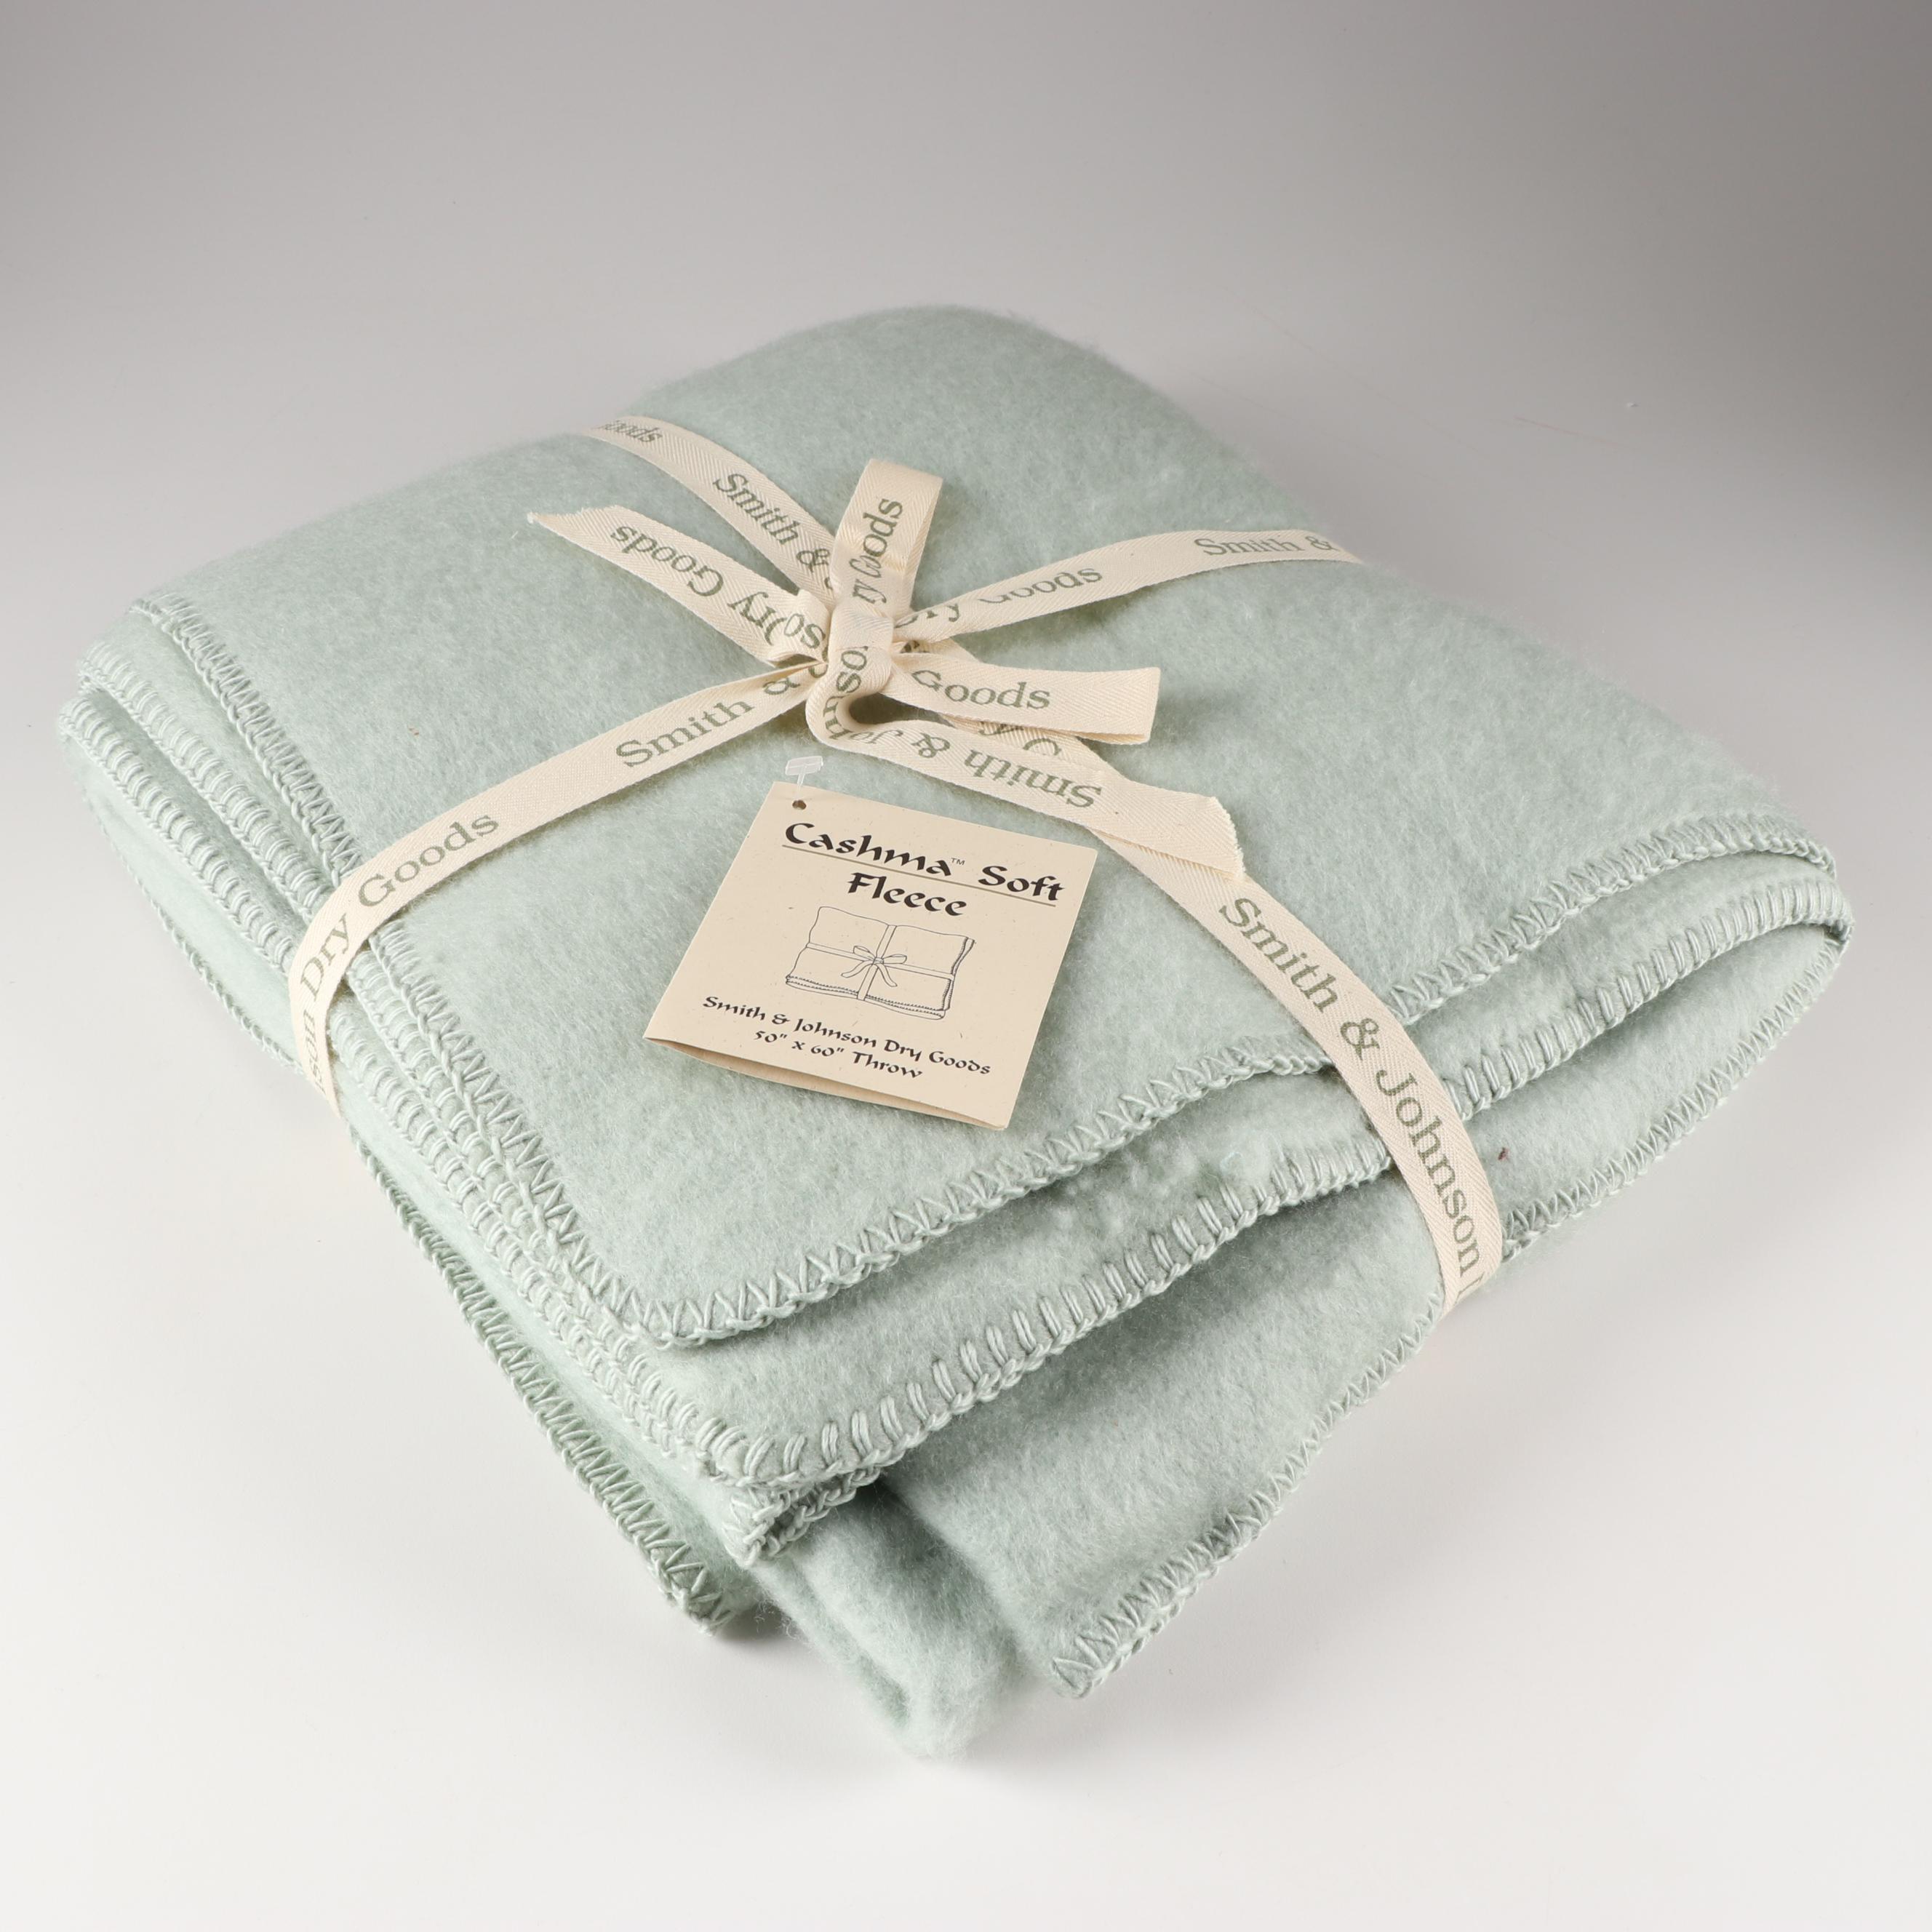 "Smith & Johnson ""Cashma Soft Fleece"" Throw Blanket"